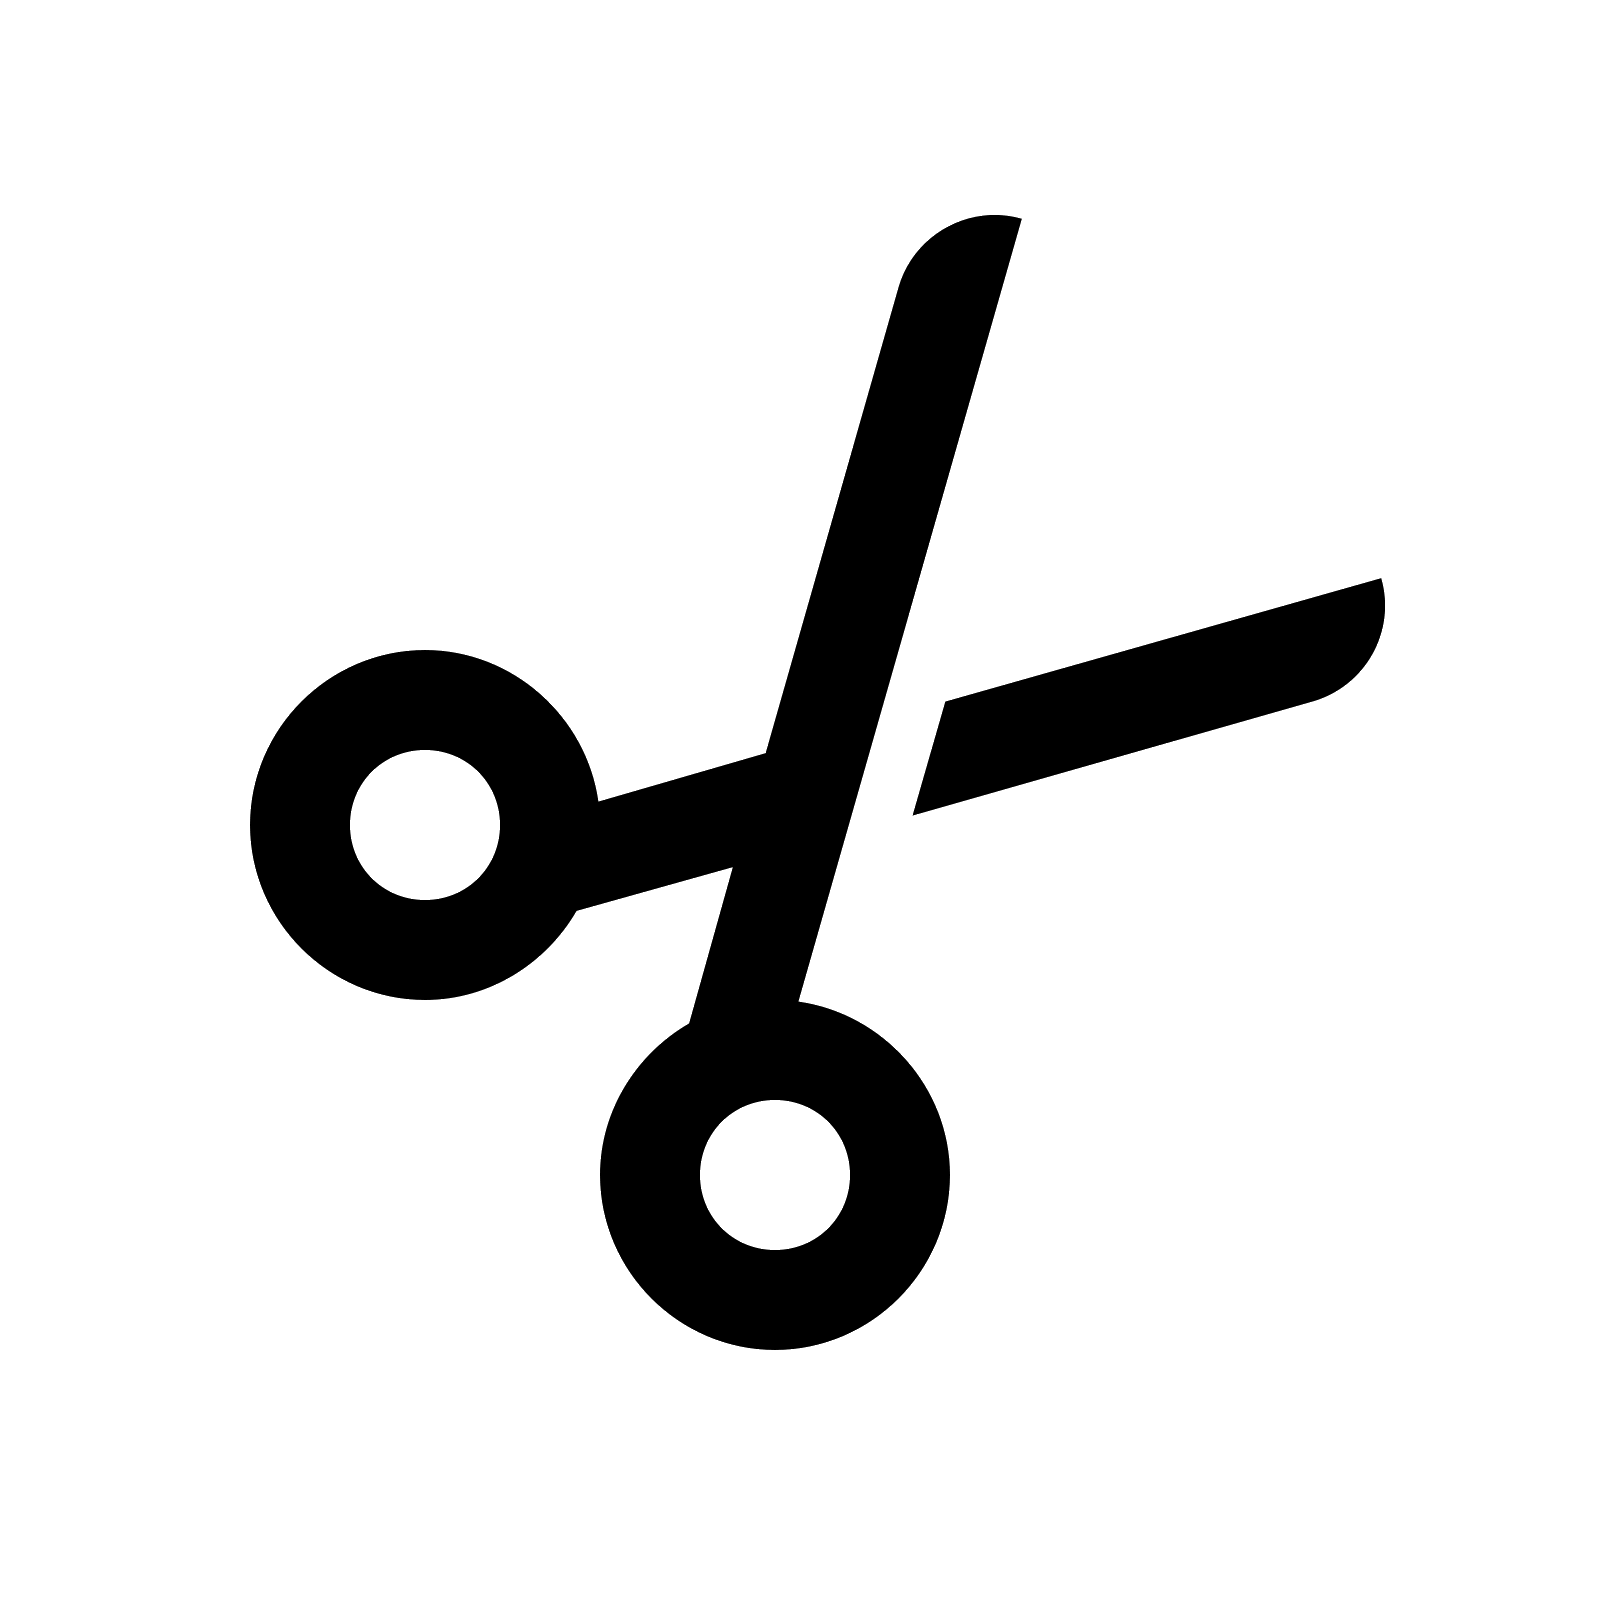 1600x1600 Tijeras Icono